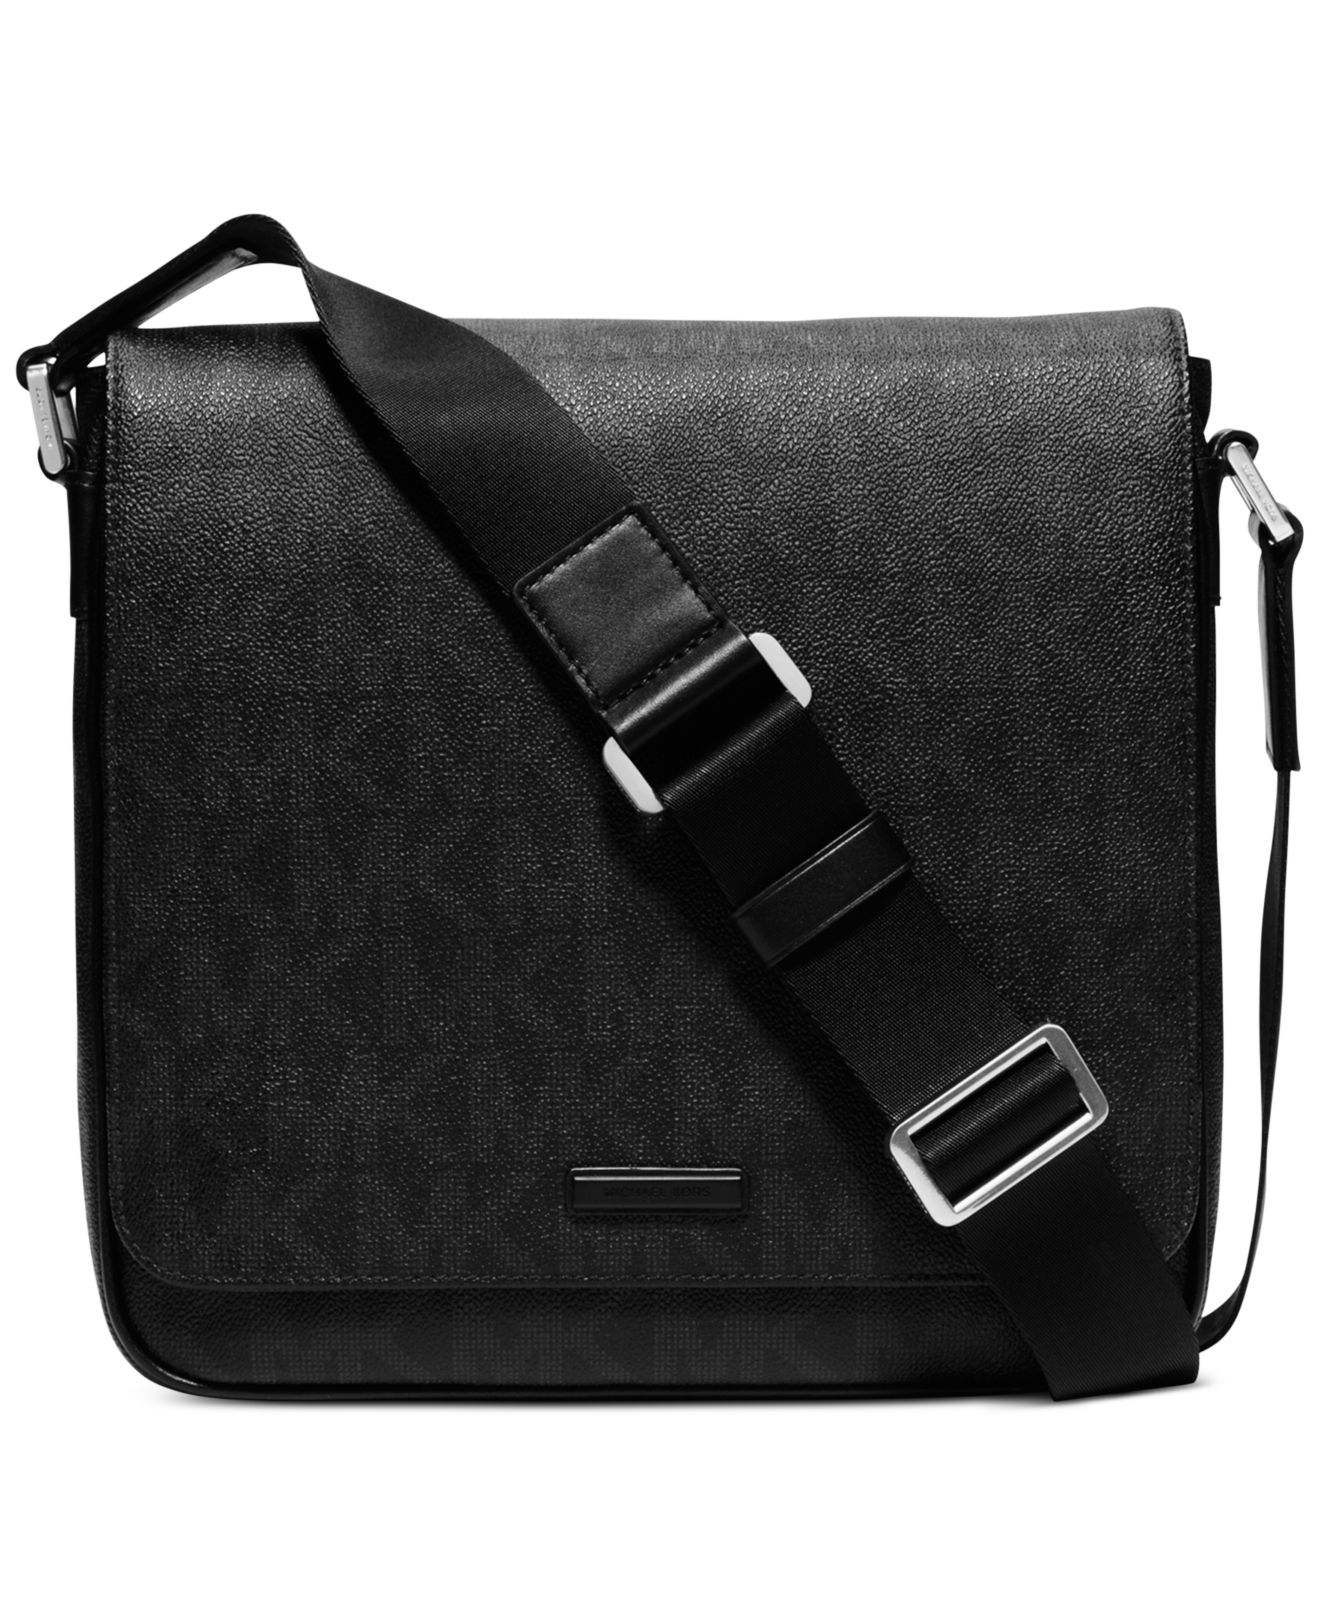 c9b18355a074 ... Black for Men Lyst Michael kors Jet Set Shadow Medium Flap Messenger  Bag in Bla ...